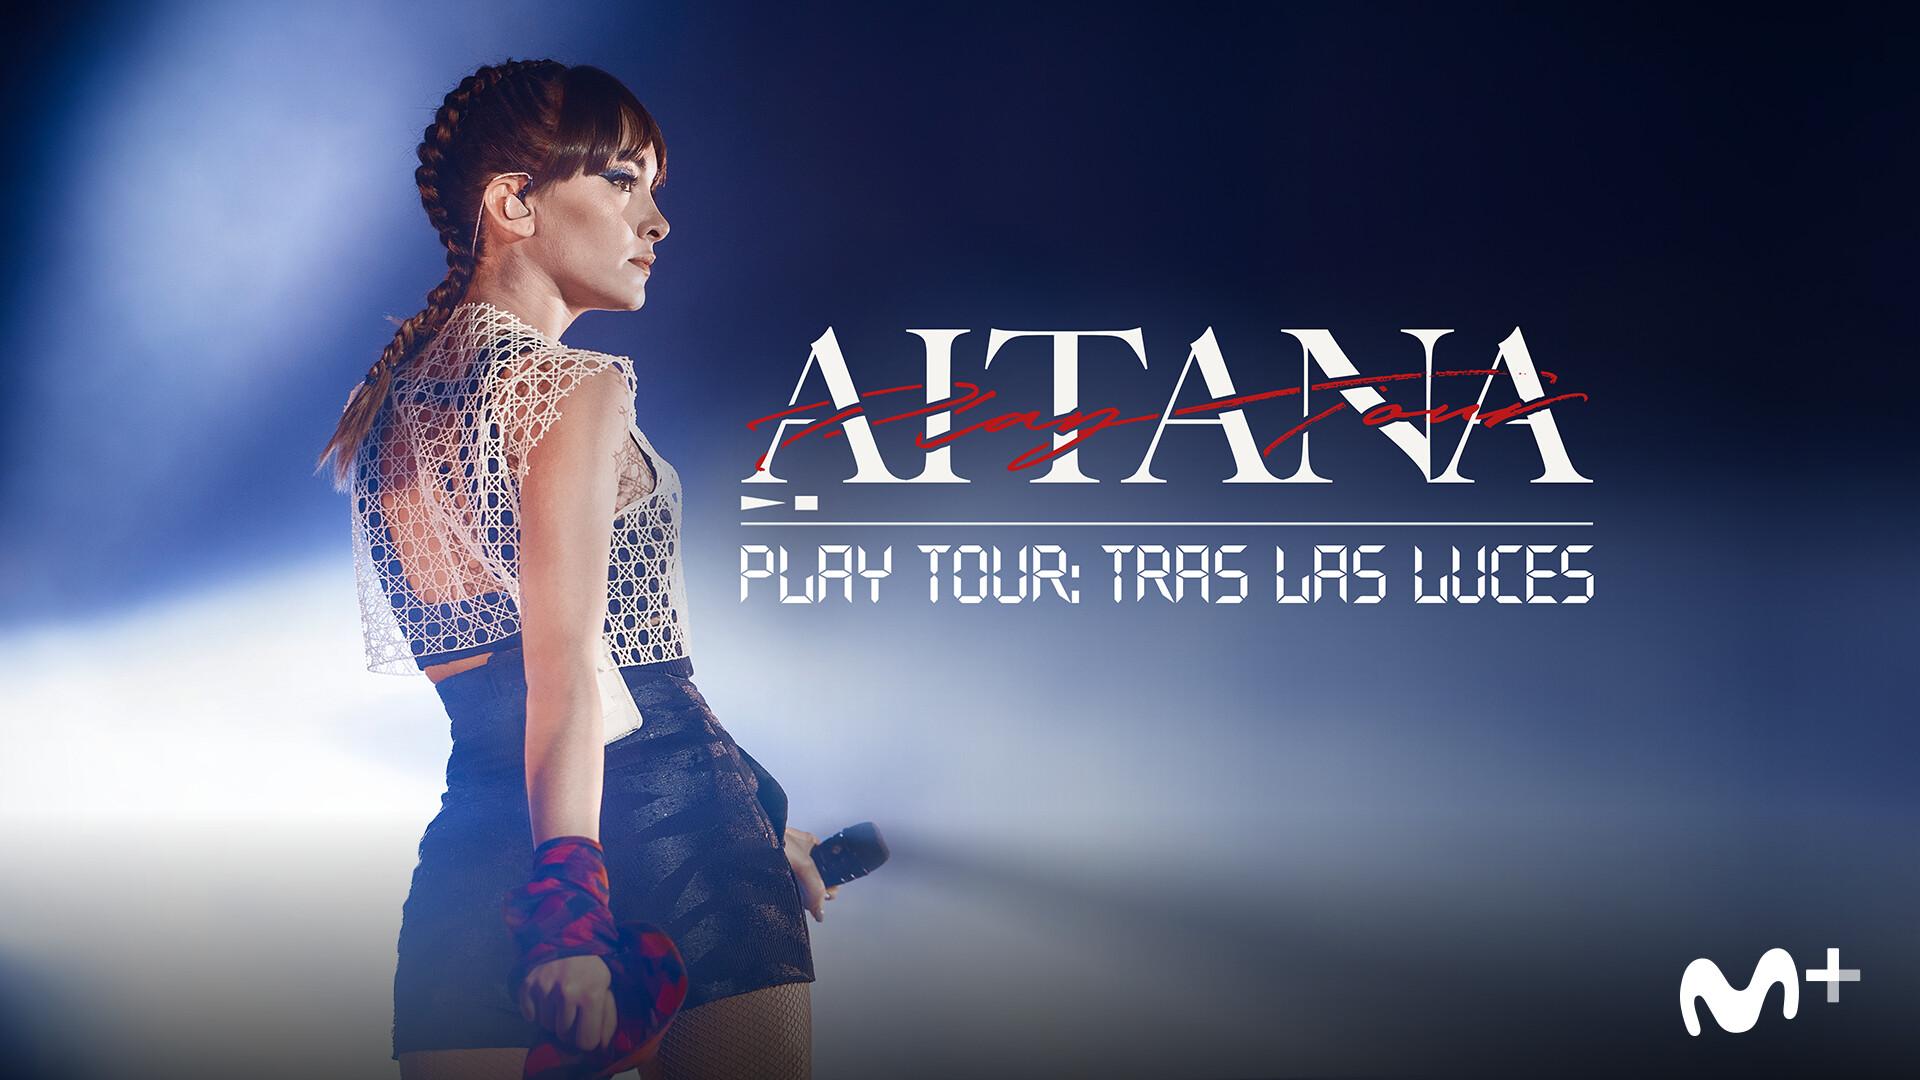 Aitana Play Tour Tras Las Luces